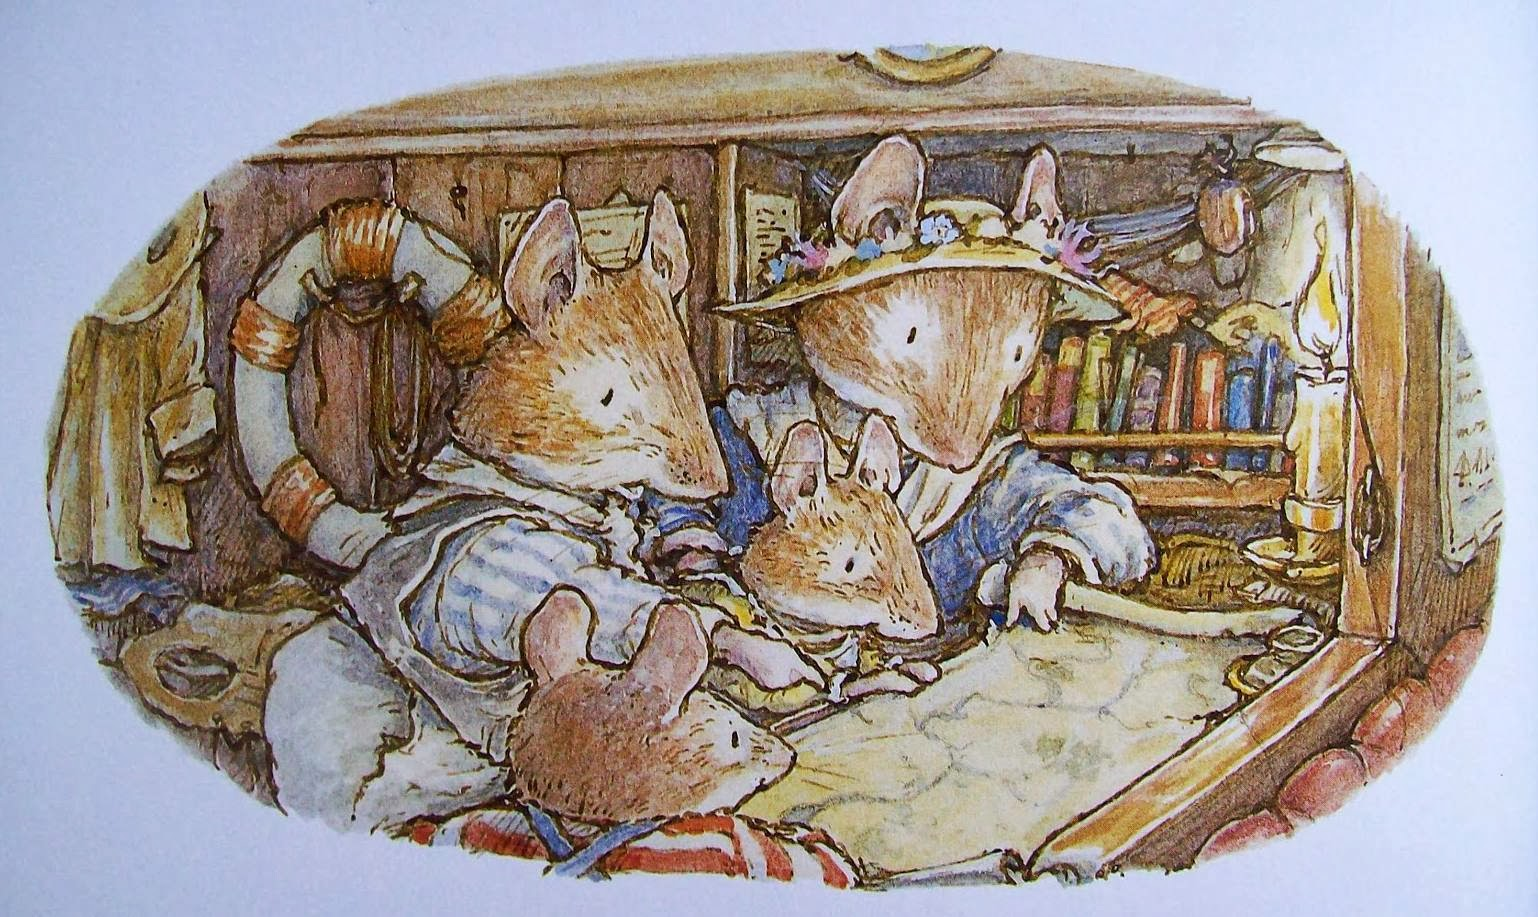 http://vanesa-locusamoenus.blogspot.com.es/2012_11_13_archive.html